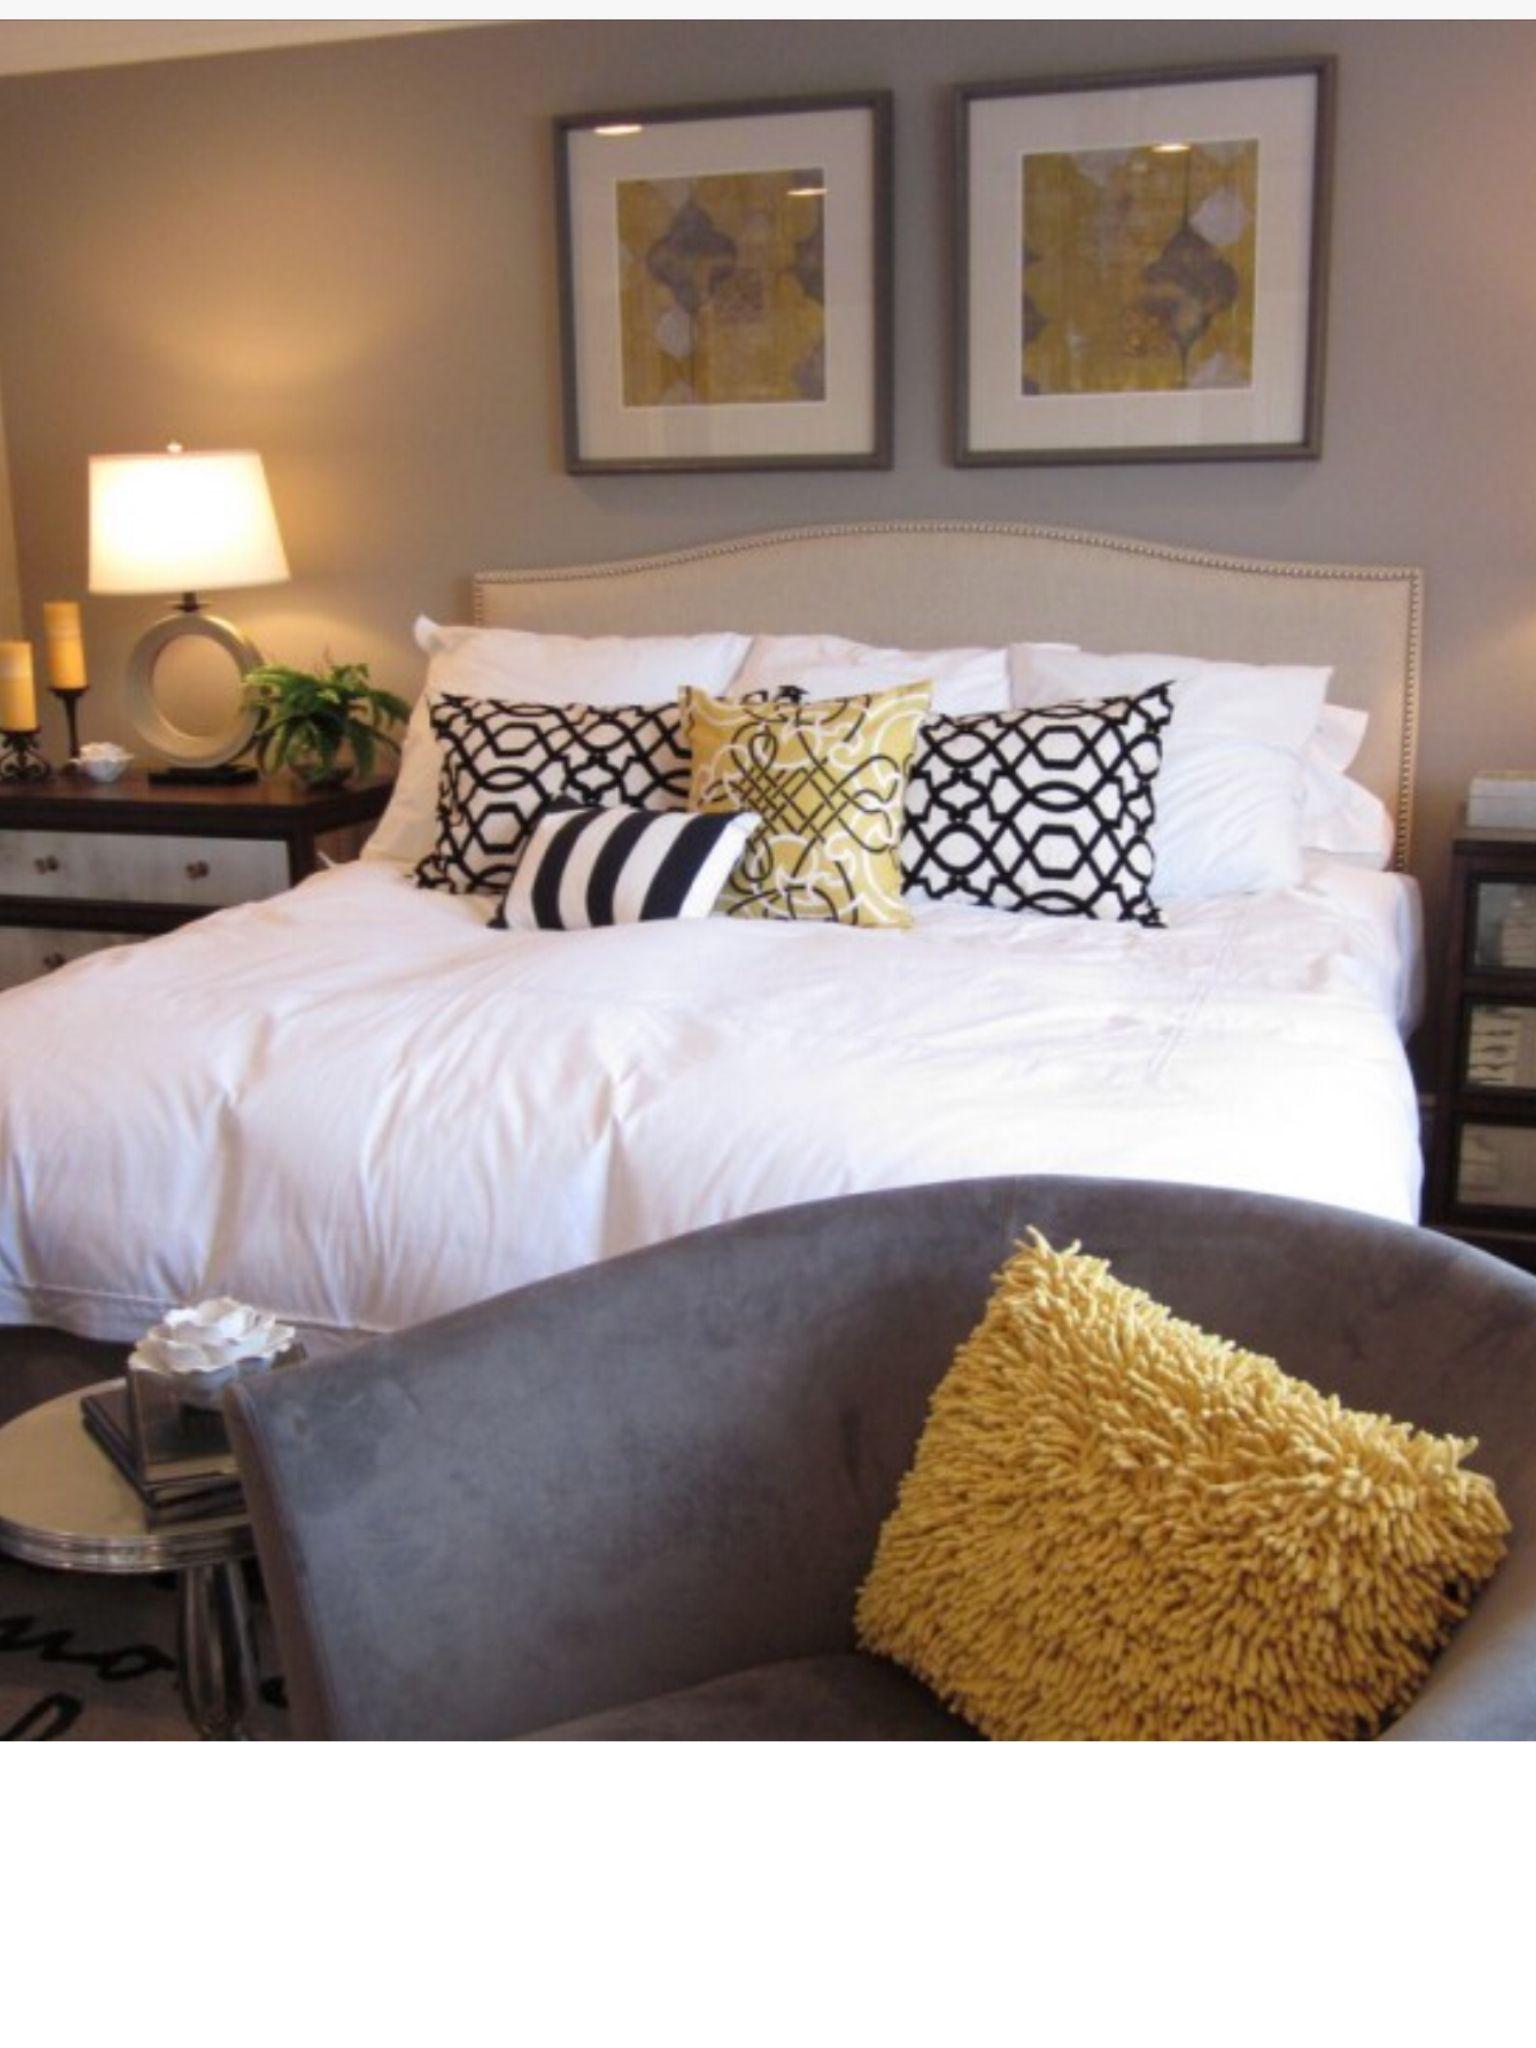 Bedroom Colour Scheme Black White Mustard And Beige Bedroom